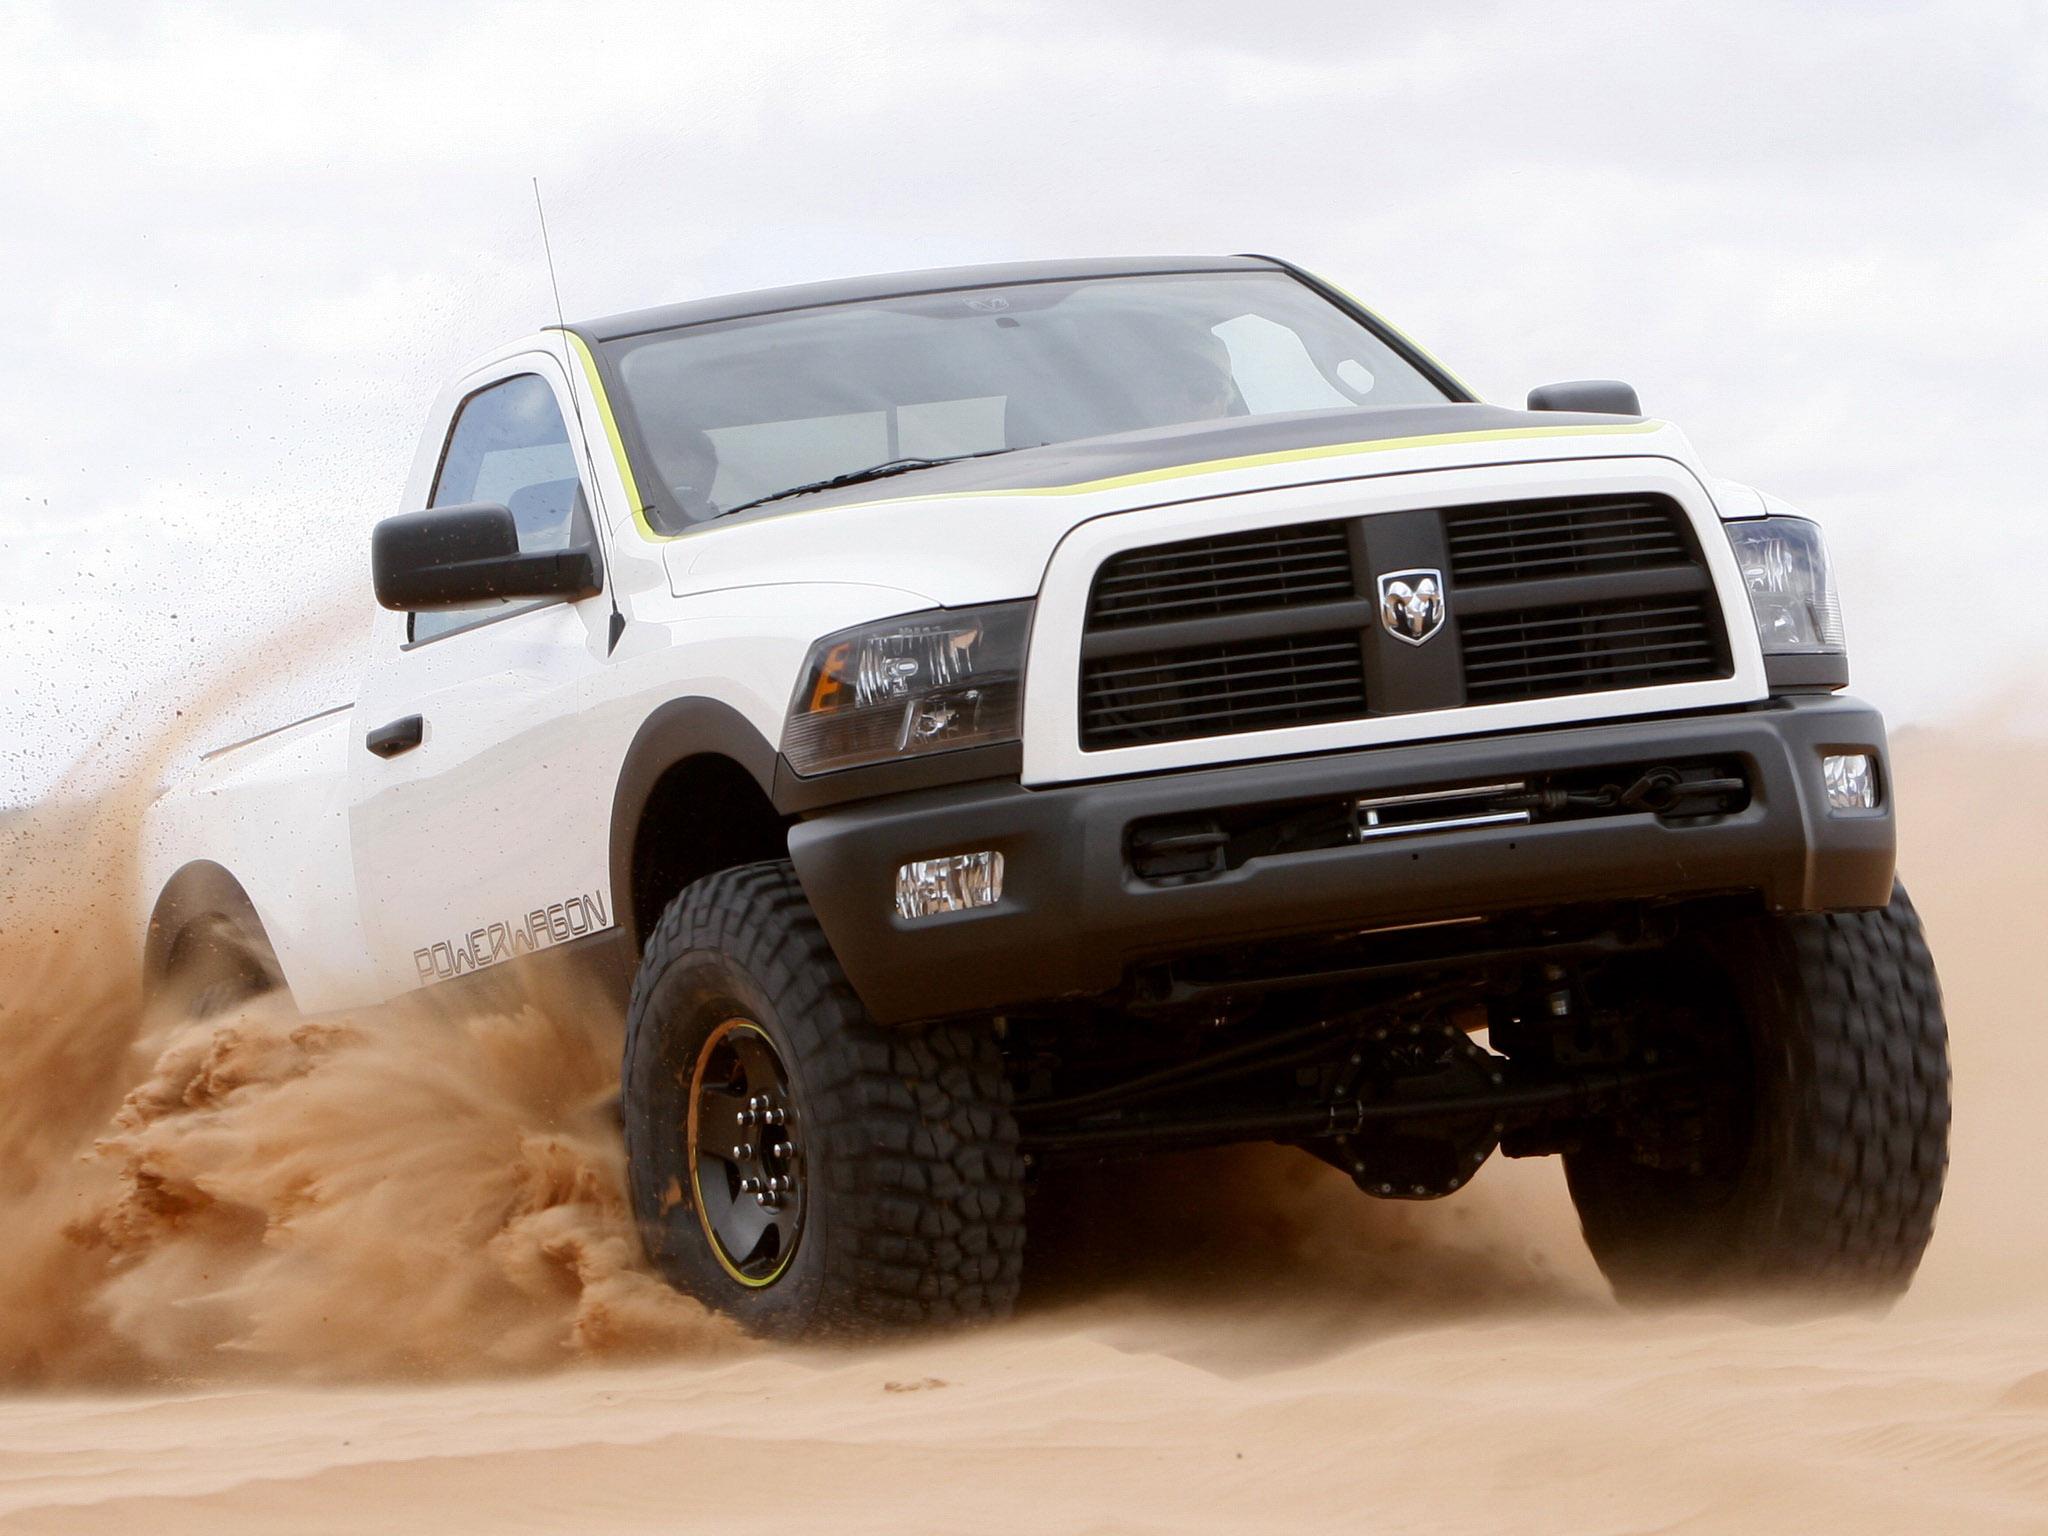 Dodge Ram BFT wallpaper Dodge Truck Trucks Buses 2048x1536 2048x1536